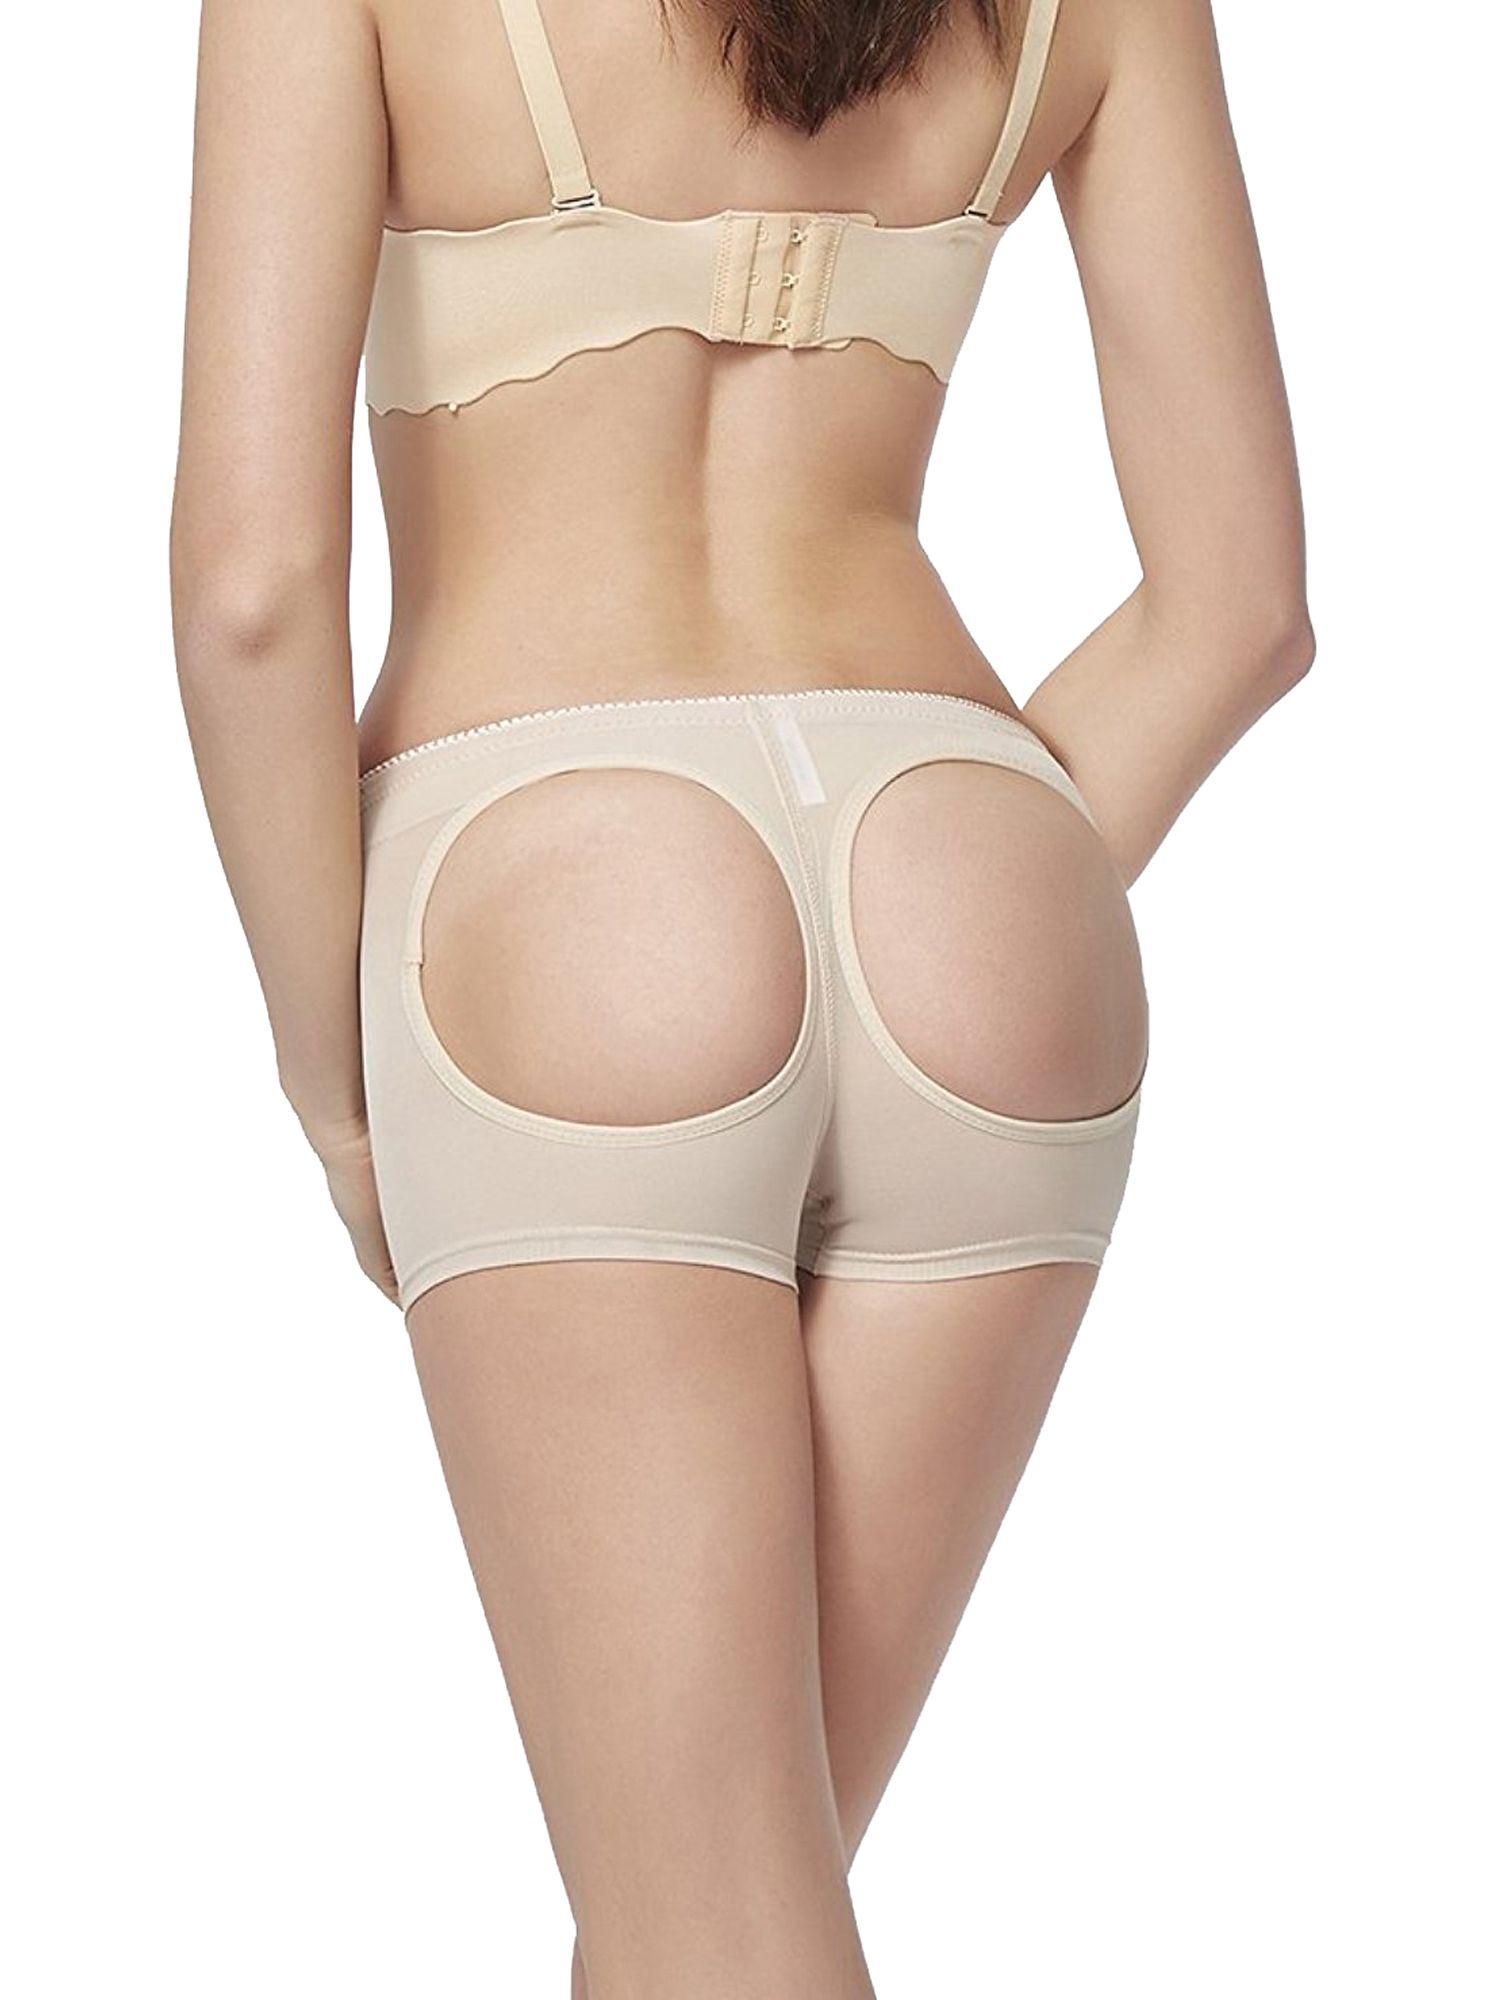 bcdf24d5fd4 SAYFUT Women s Sexy Seamless Butt Lifter Hip Enhancer Boyshorts Body Shaper  Pants Tummy Control Panties Shapewear Underwear 2-Pack Hip